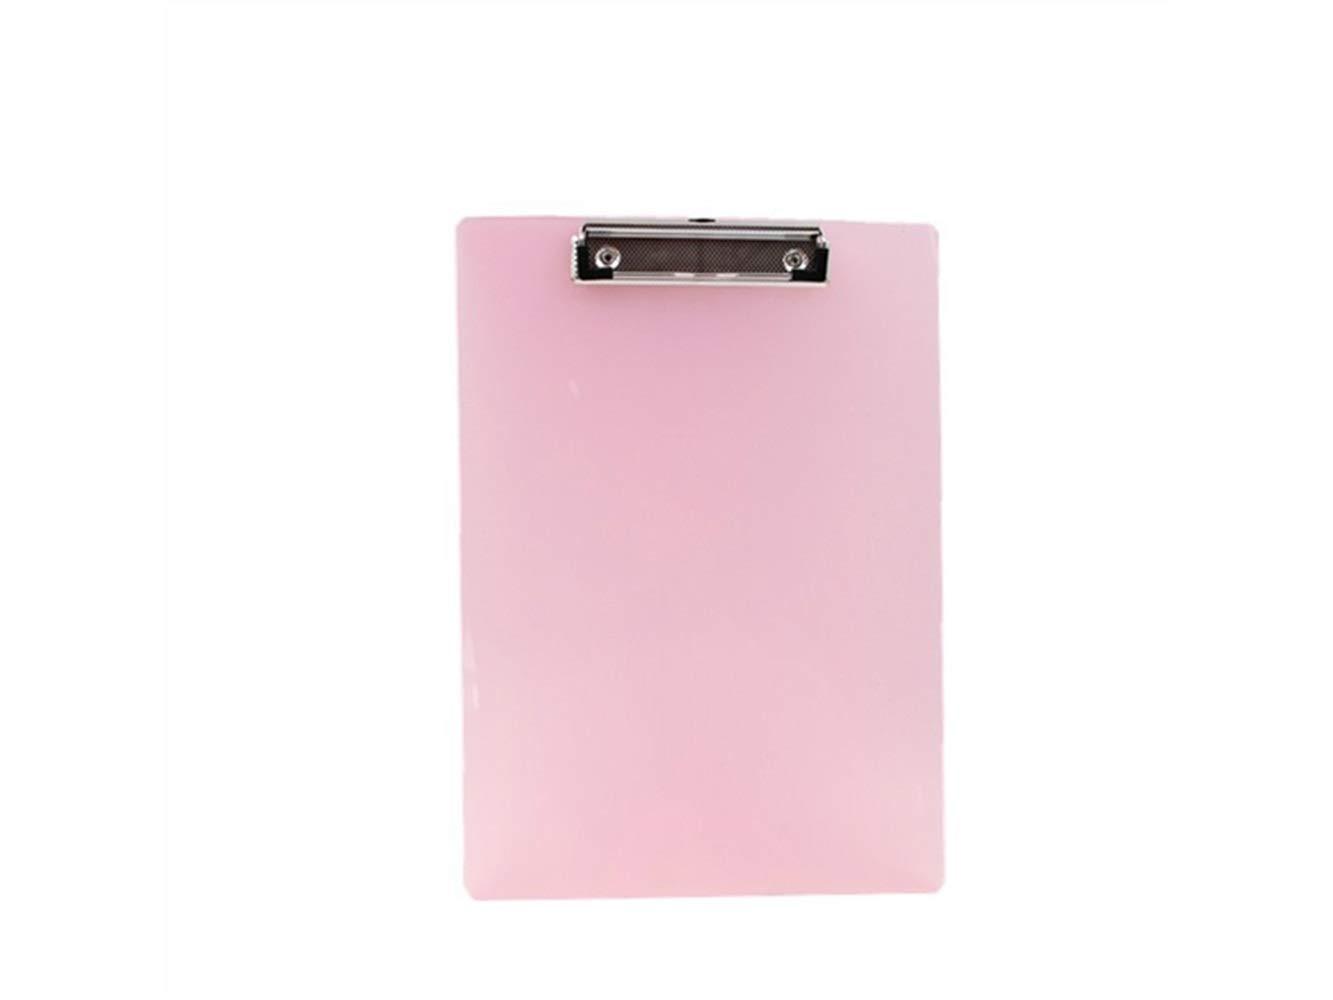 JxucTo A4 Transparent Colourful Clipboard Portable Document Folders Plastic Writting Pad (Random Colour)